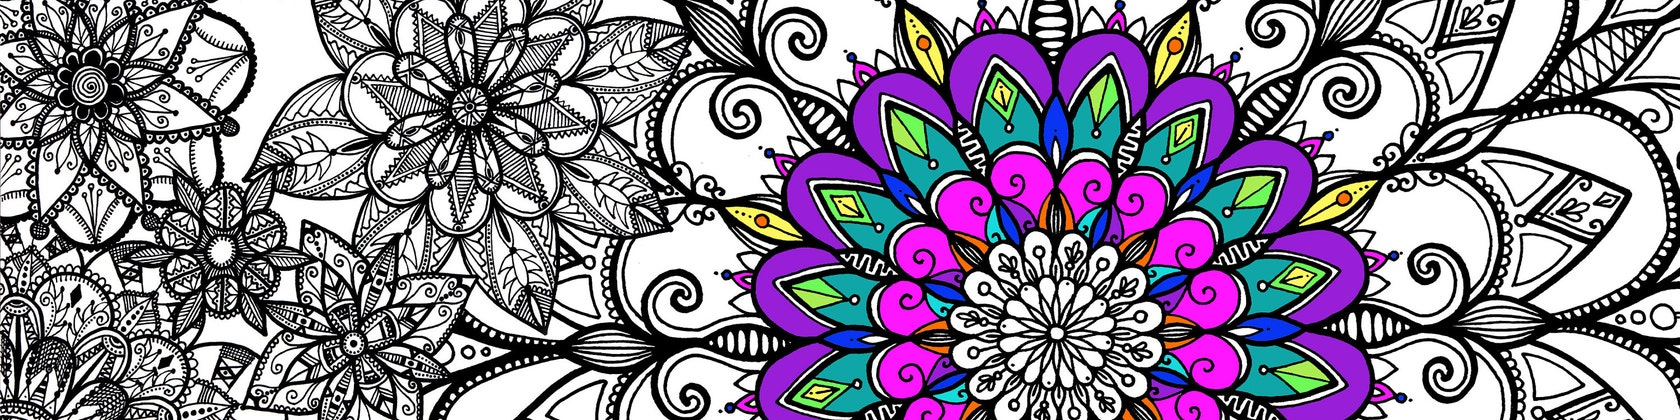 Coloriage Fleur Tps.Creations Joelle Mercier Ze Sklepu Creationsjmercier Na Etsy